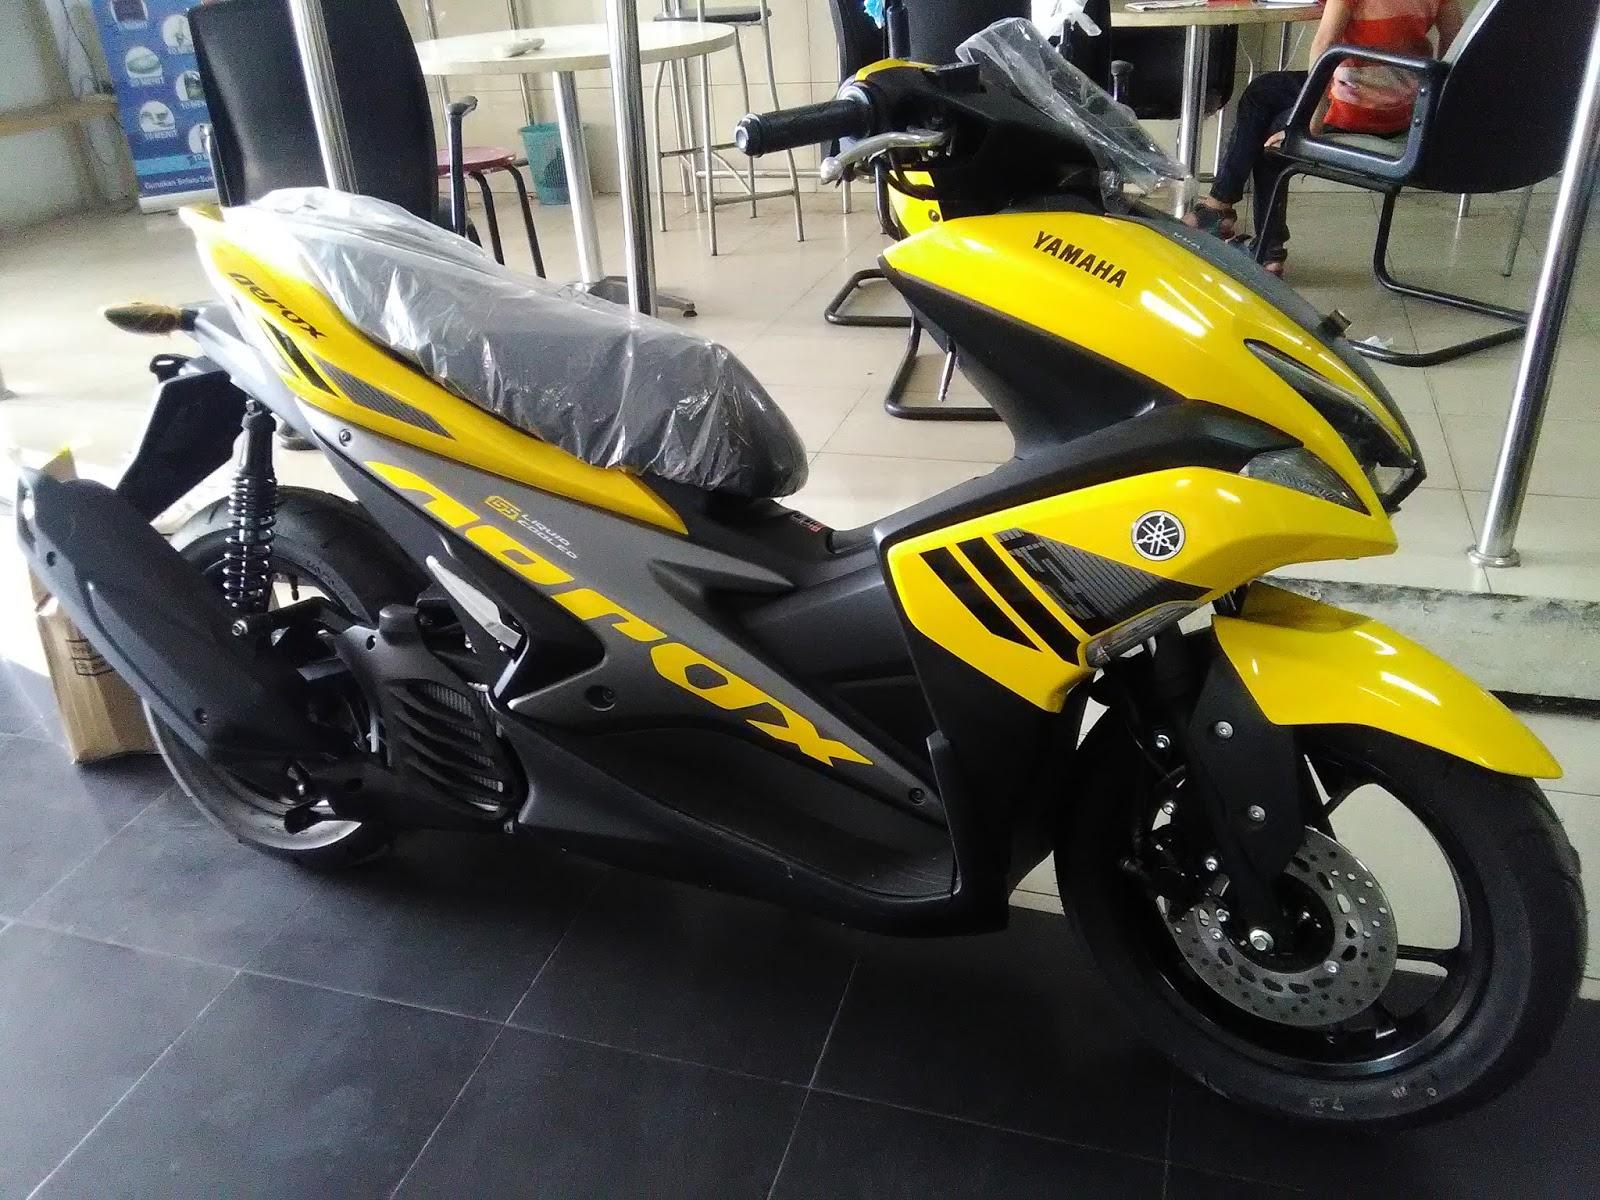 Aerox 155 Vva R Version S Version Daftar Harga Motor Yamaha Terbaru